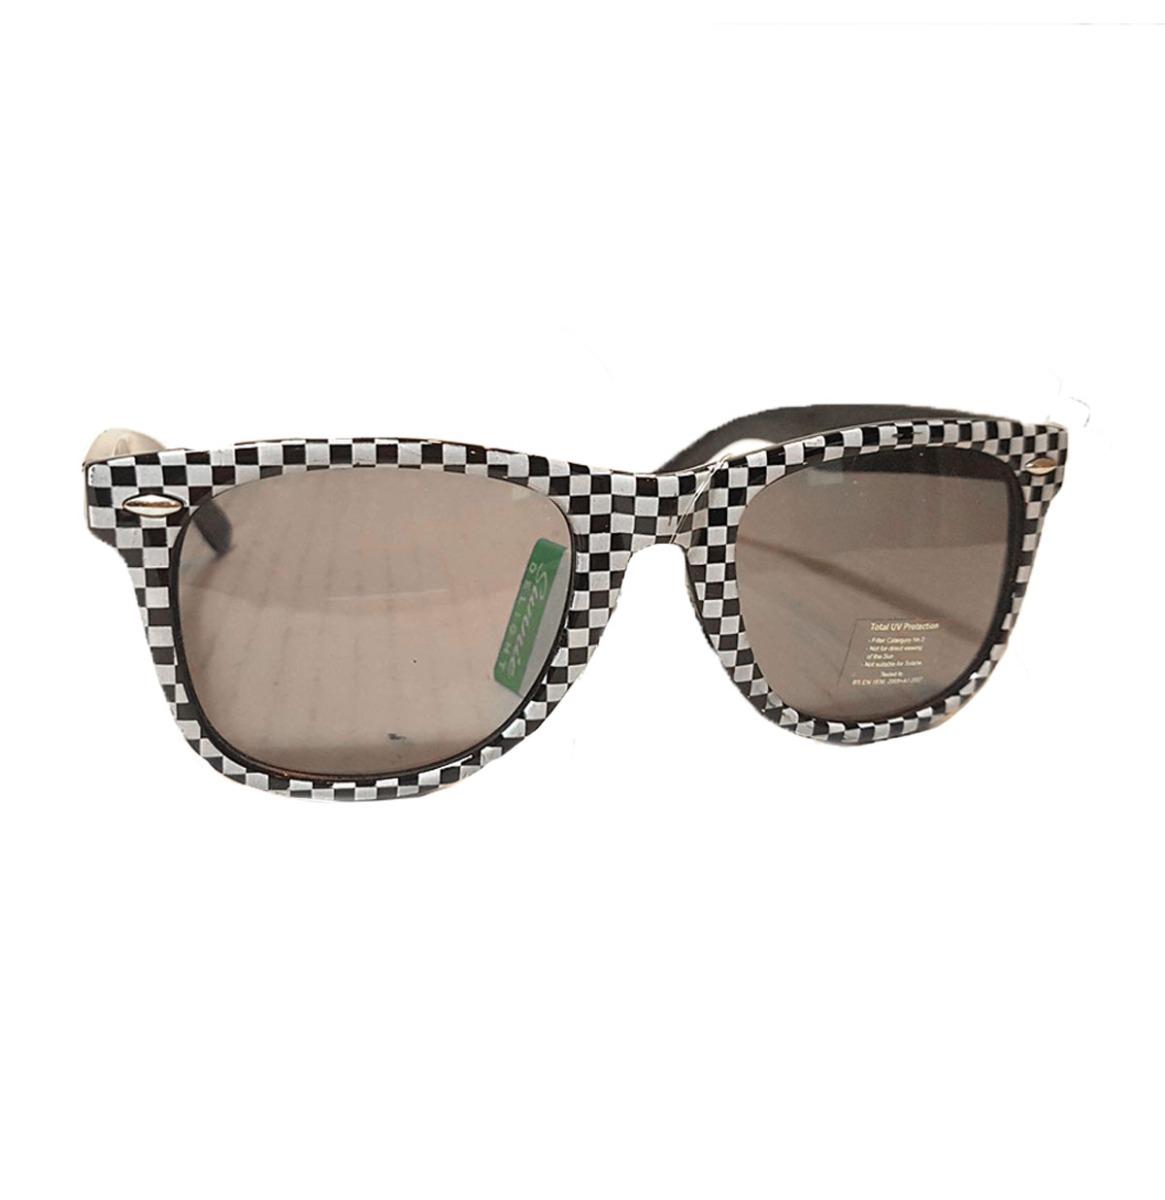 Revive Retro Wayfarer Checker black & white Sunglasses